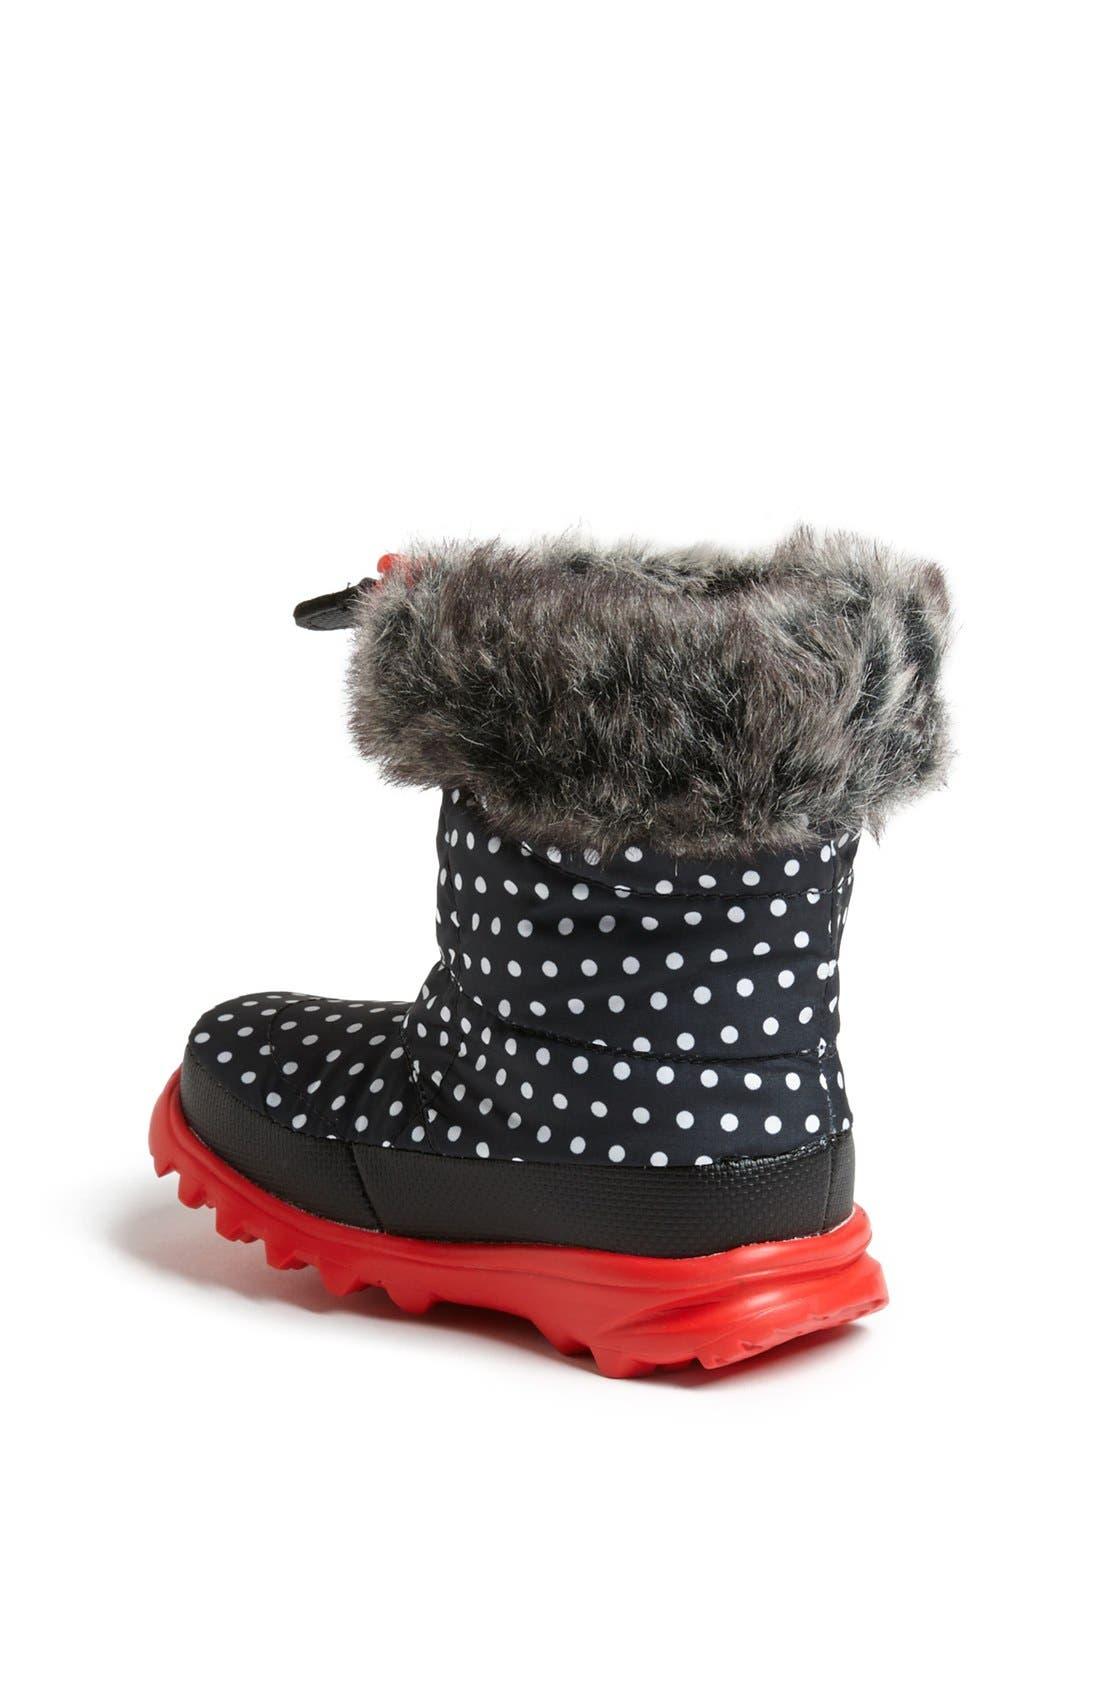 Alternate Image 2  - The North Face 'Nuptse Fur II' Winter Boot (Walker & Toddler)